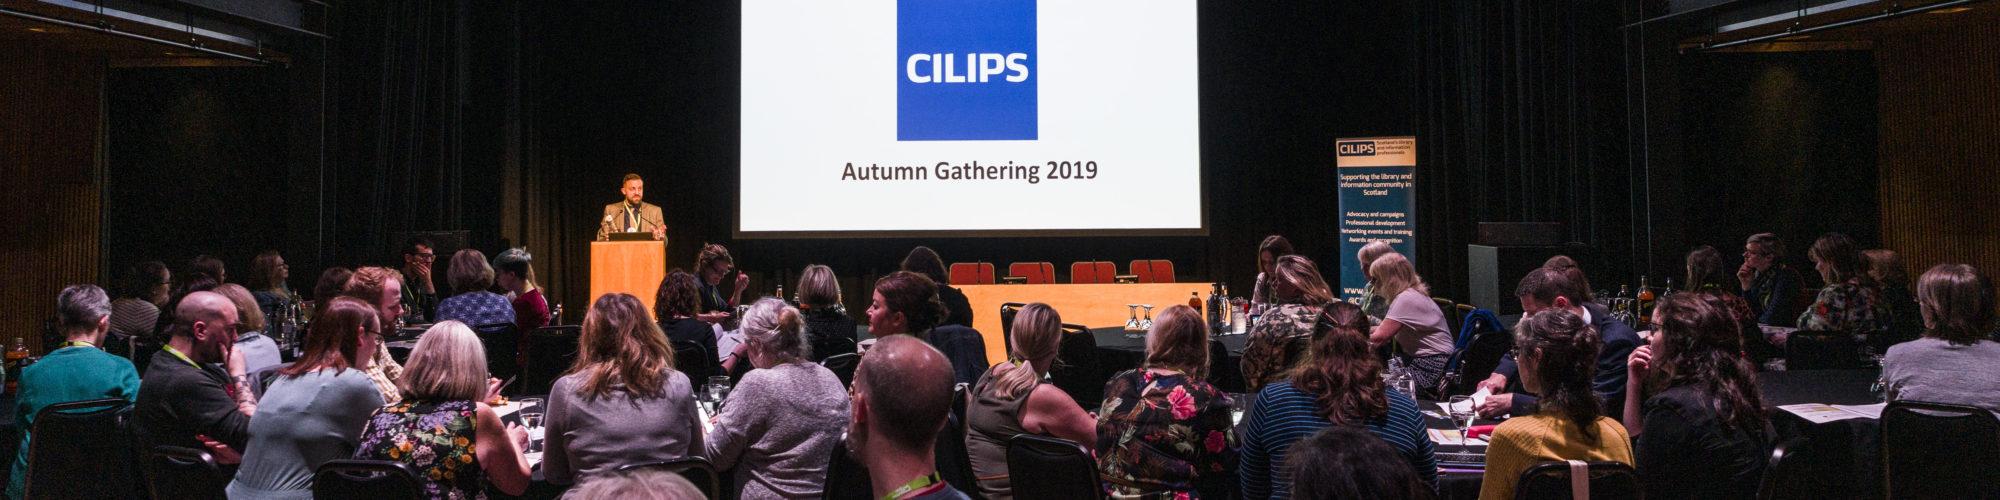 https://www.cilips.org.uk/wp-content/uploads/2020/07/AG-website-scaled.jpg